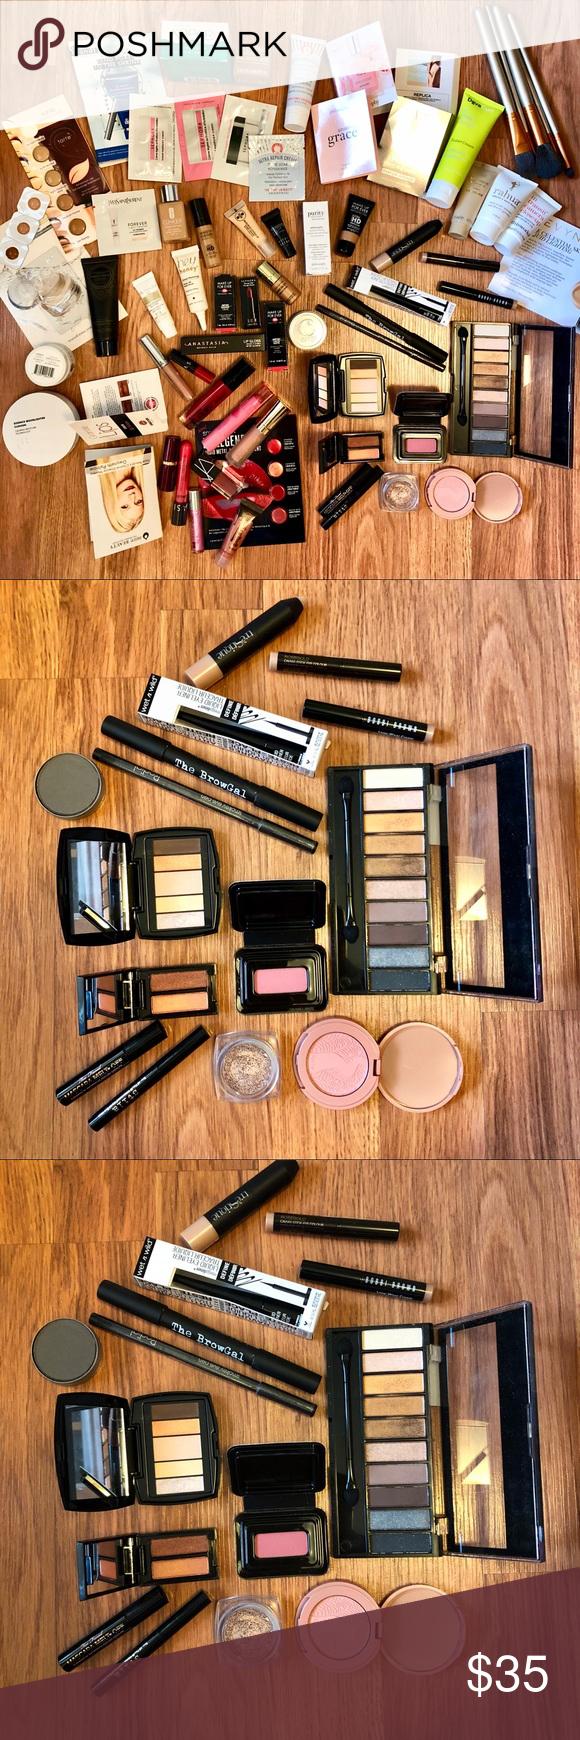 Bundle of name brand makeup (With images) Makeup, Brand